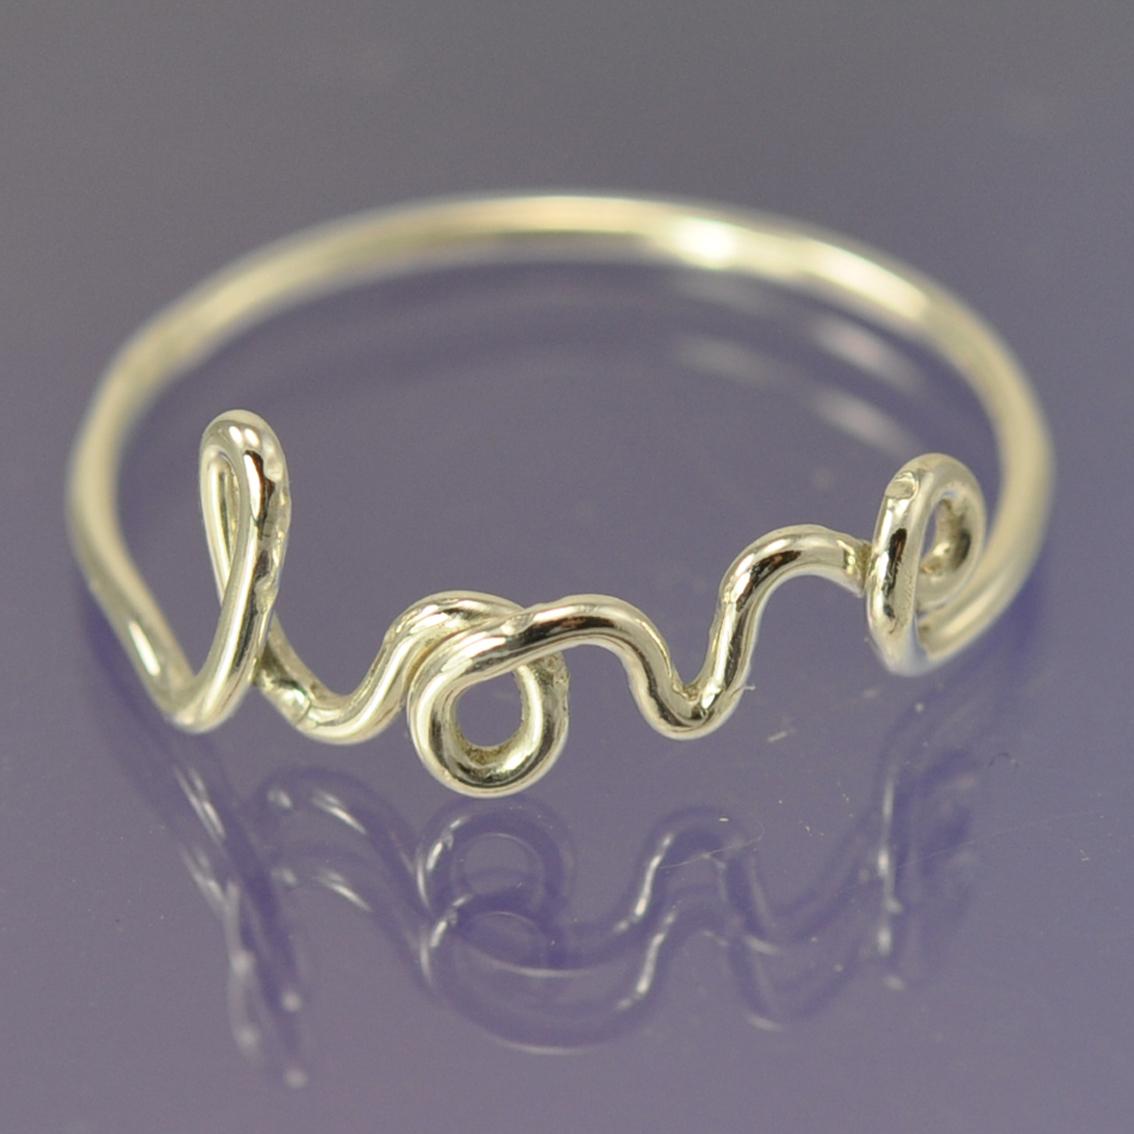 Love ring. Silver   Chris Parry - Handmade Jewellery - Designer / Maker